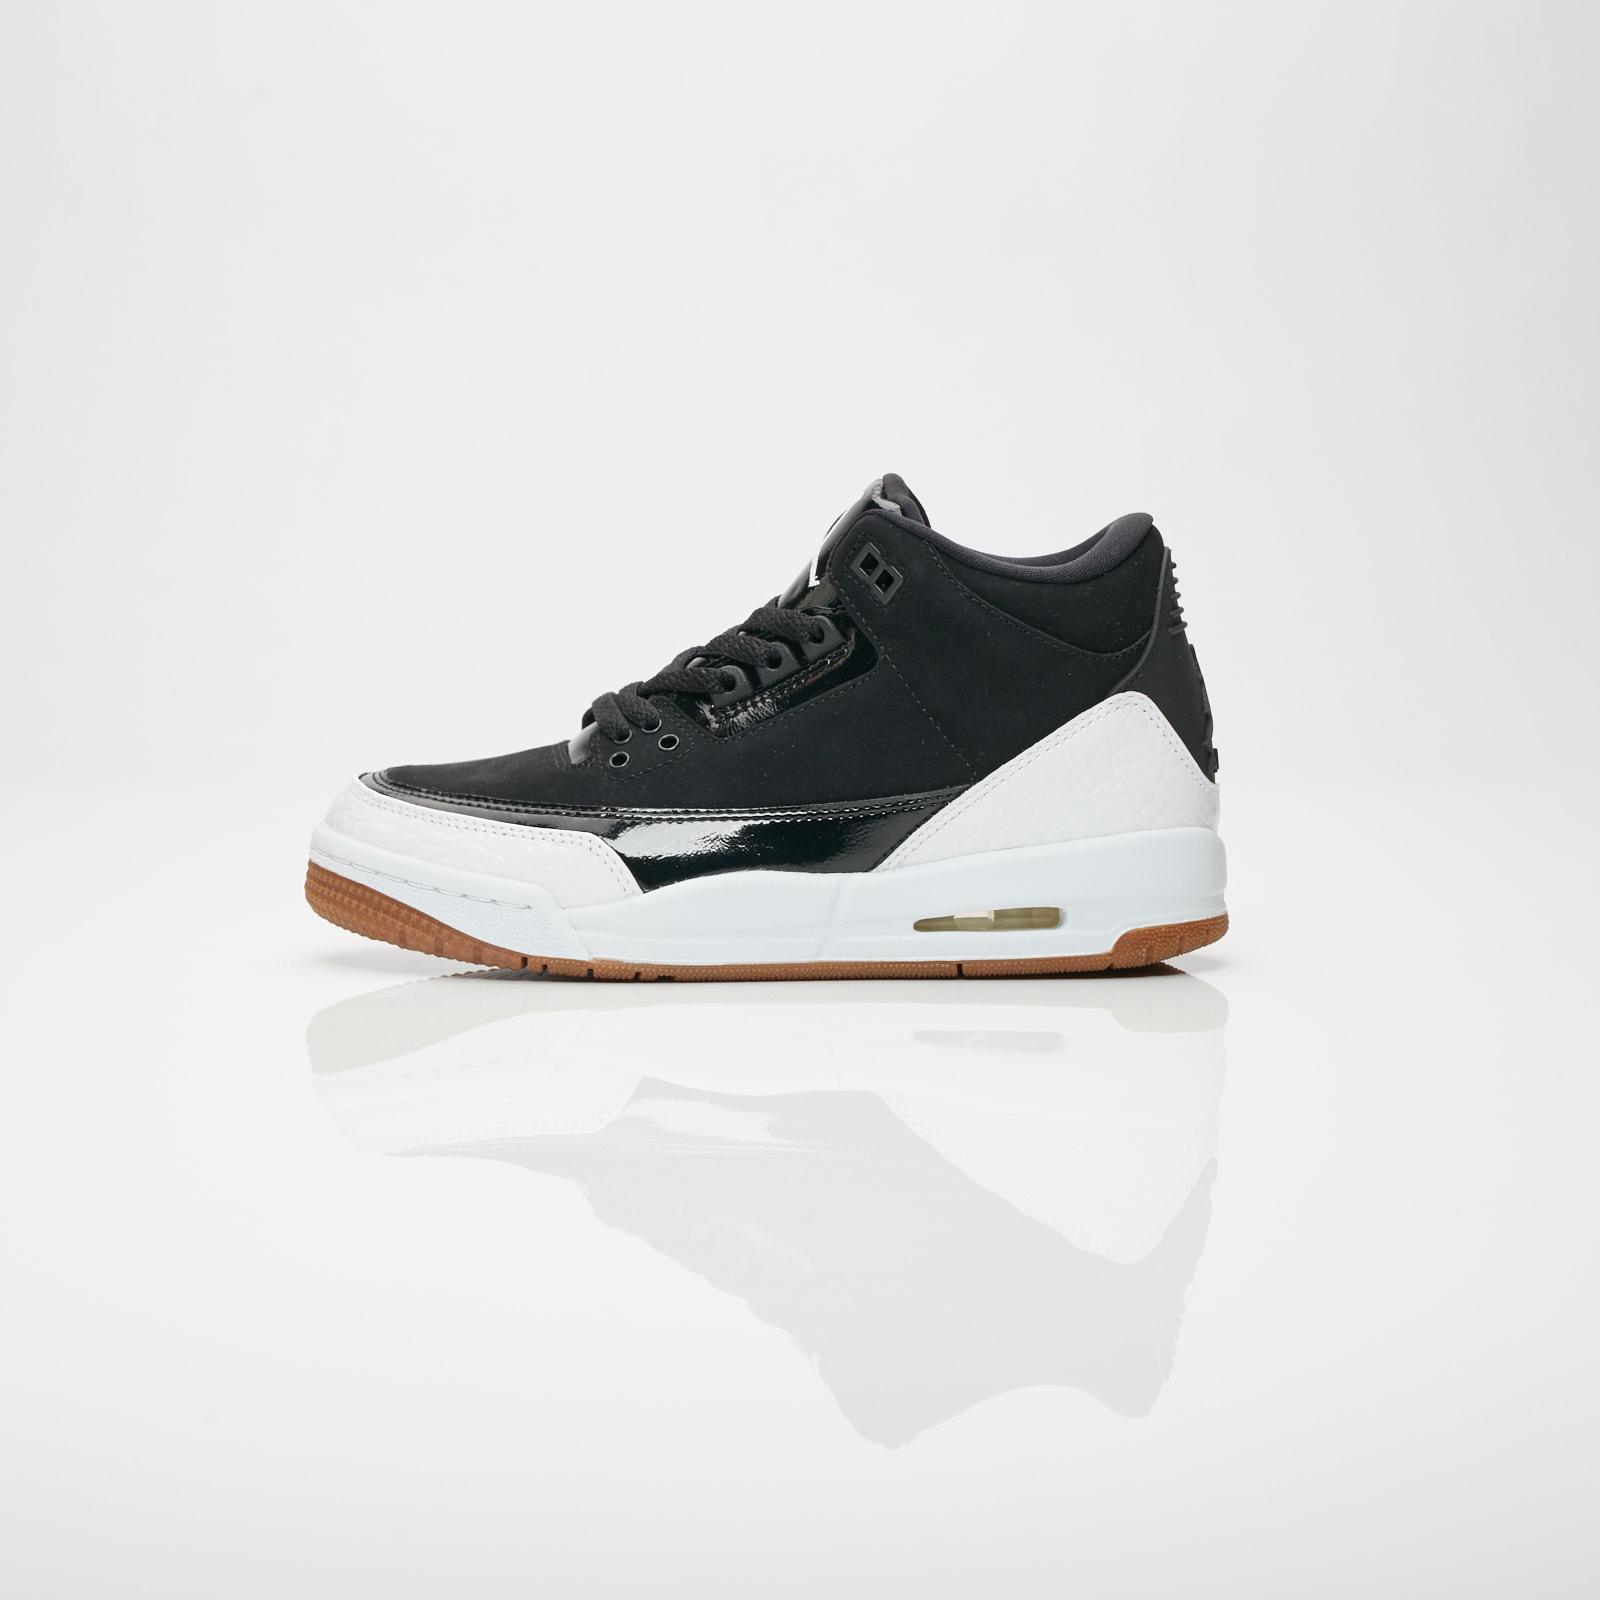 big sale c6c22 a1199 Jordan Brand Air Jordan 3 Retro GS - 441140-022 - Sneakersnstuff   sneakers  & streetwear online since 1999